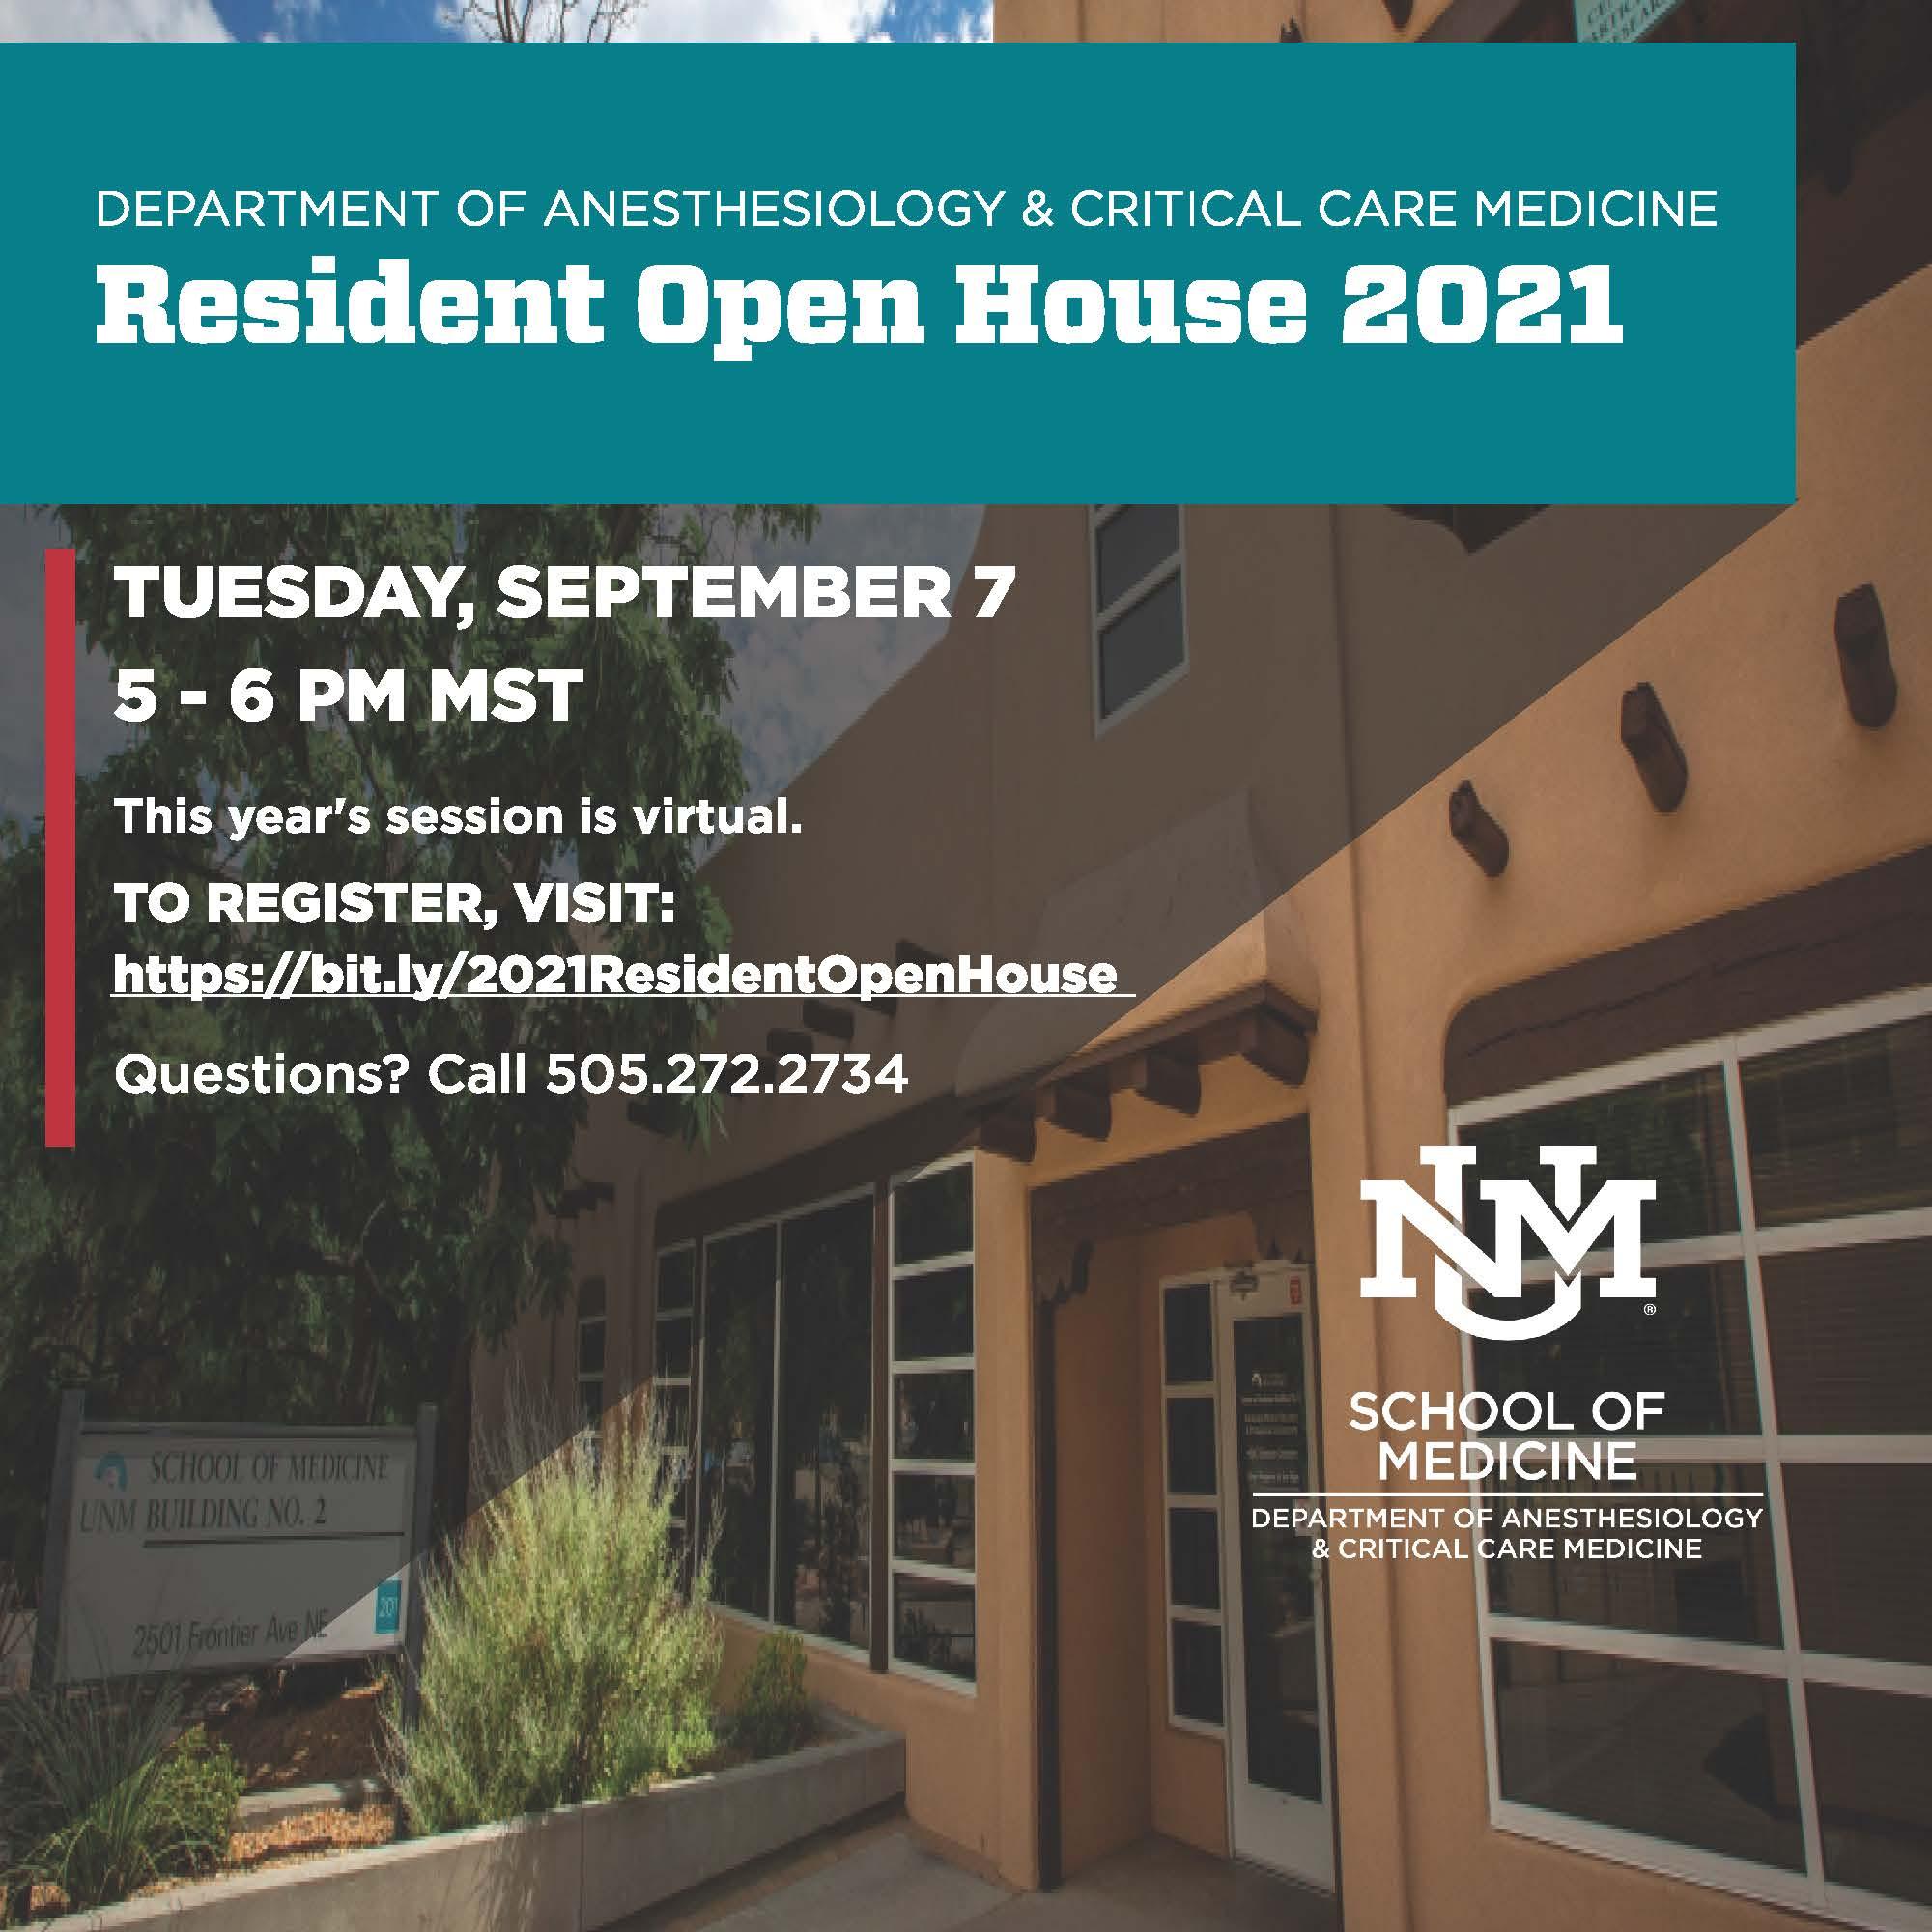 anes open house flier مع نص على صورة لمبنى med two